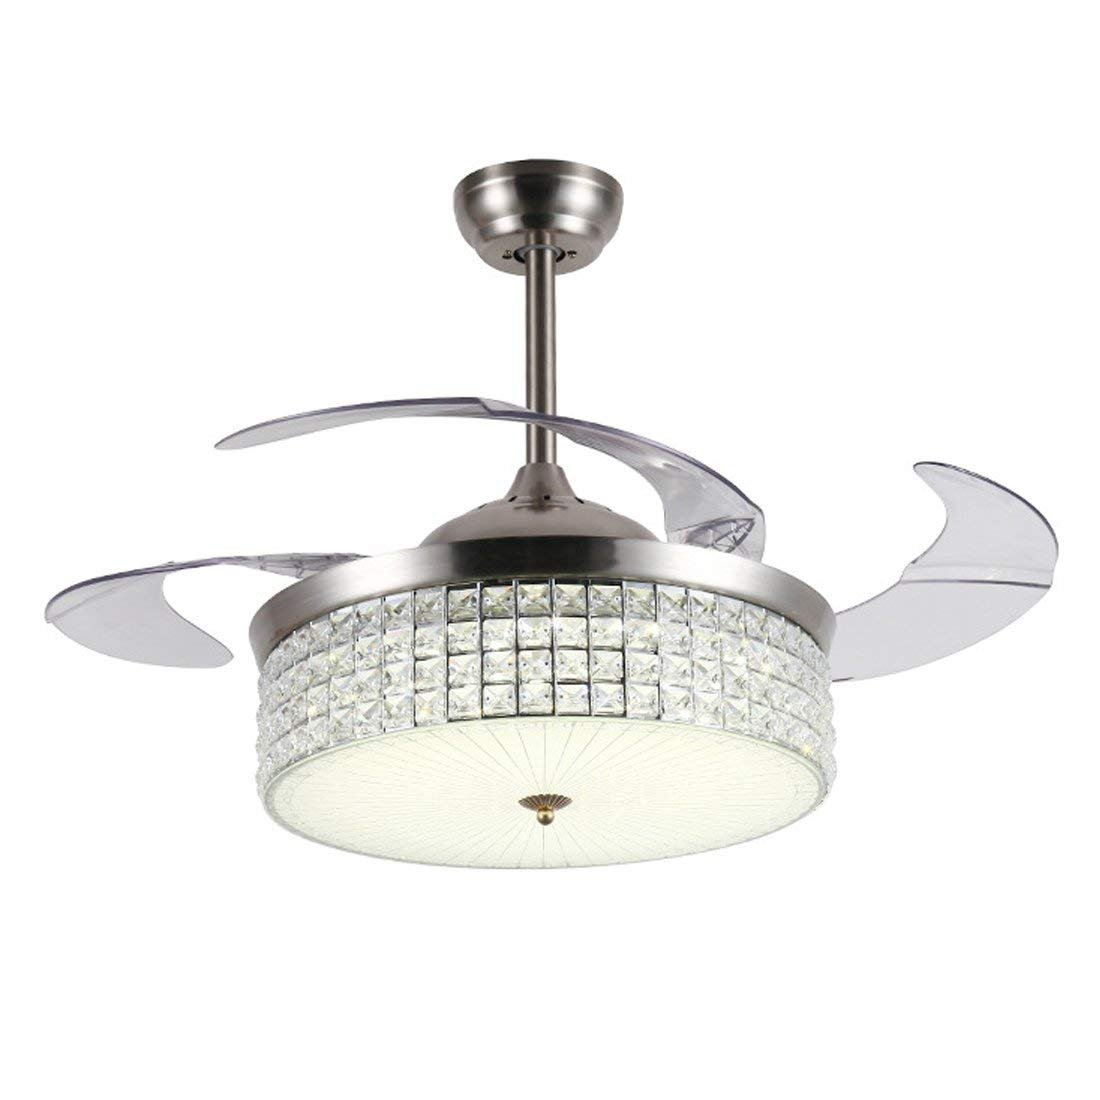 42 modern led ceiling fan lamp remote control chandelier home lighting fixtures for dining room bathroom bedroom livingroom amazon com